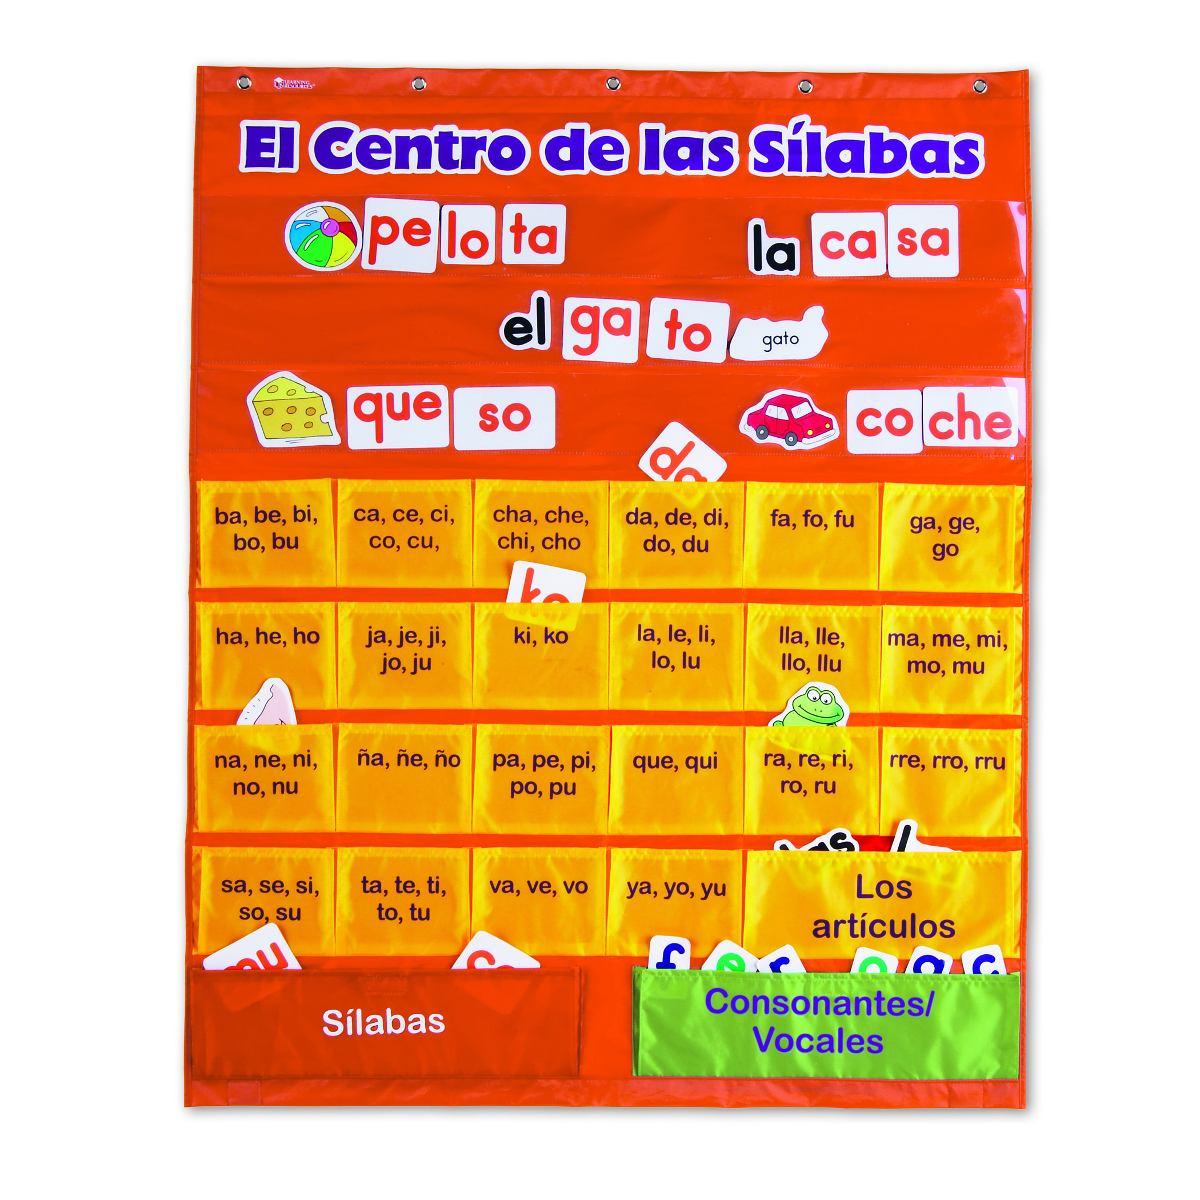 Espanol De Recursos De Aprendizaje Silabas Bolsillo Carta